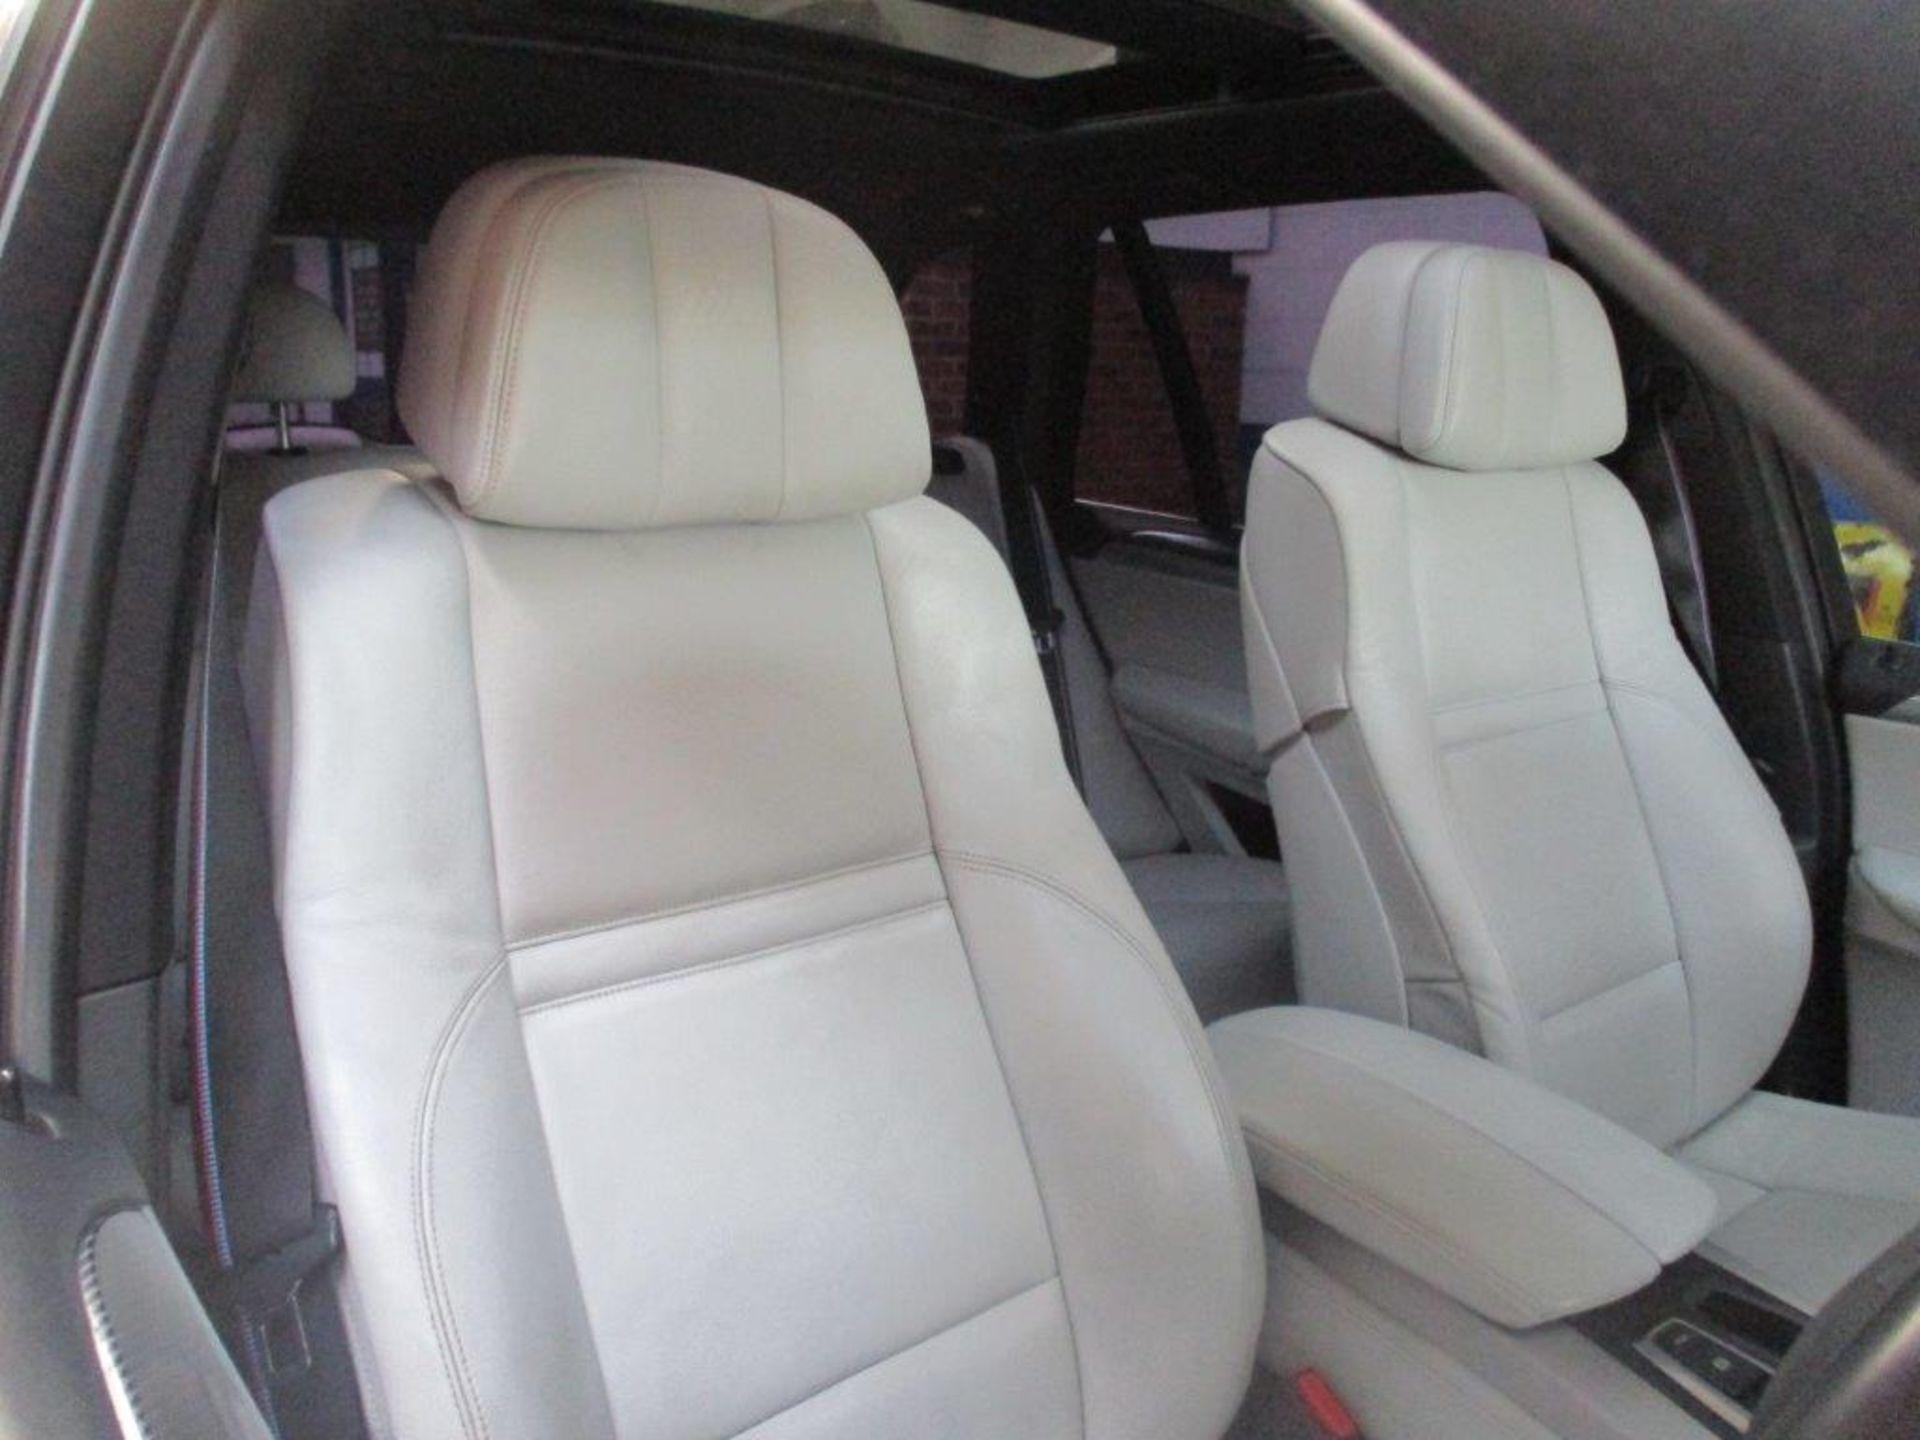 60 10 BMW X5 M Turbo Auto - Image 22 of 35